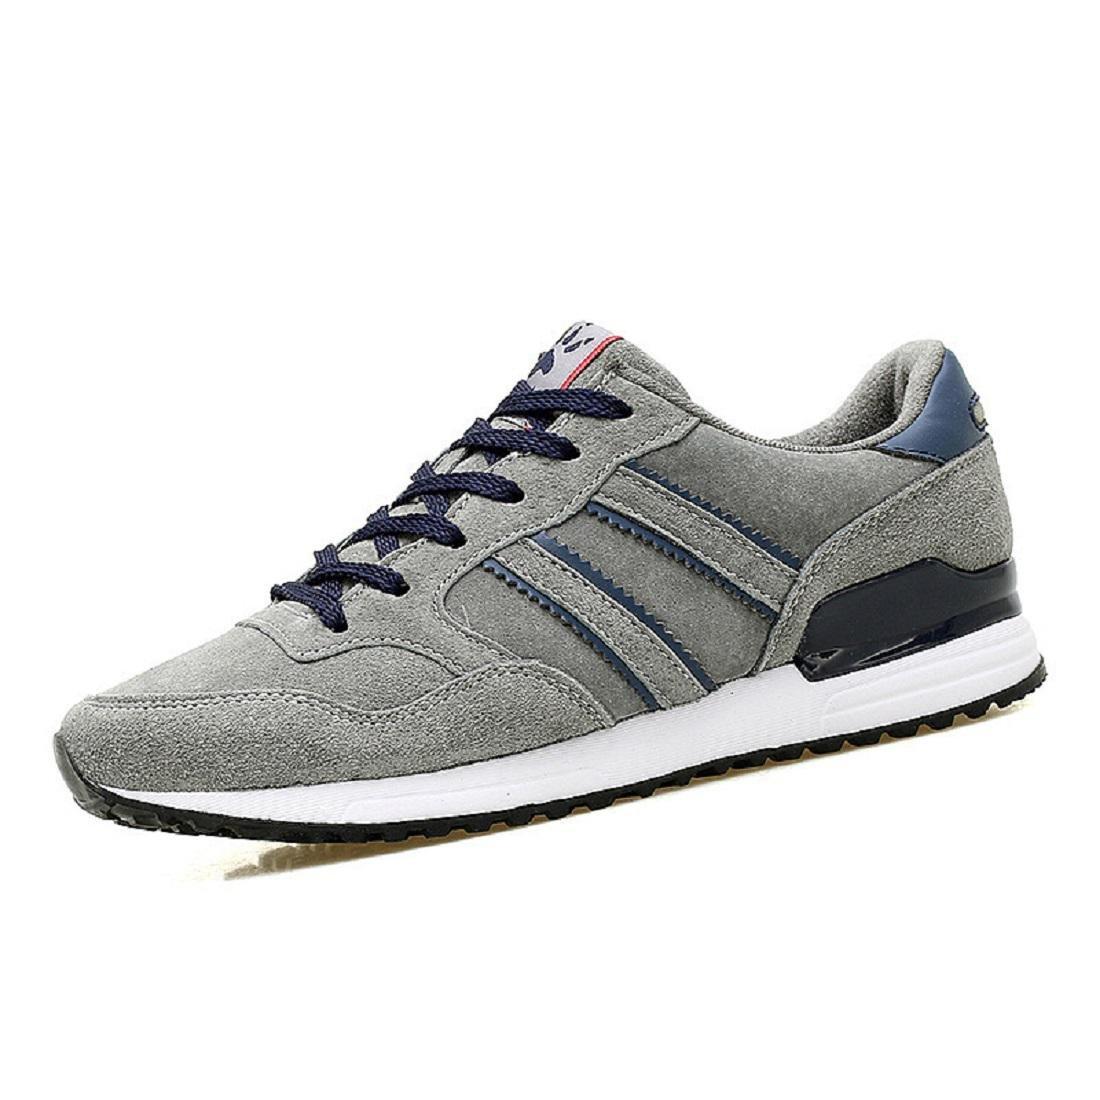 Herren Sportschuhe Atmungsaktiv Flache Schuhe Segeltuchschuhe Freizeit Laufschuhe Lässige Schuhe EUR GRÖSSE 39-44 , blue , 44